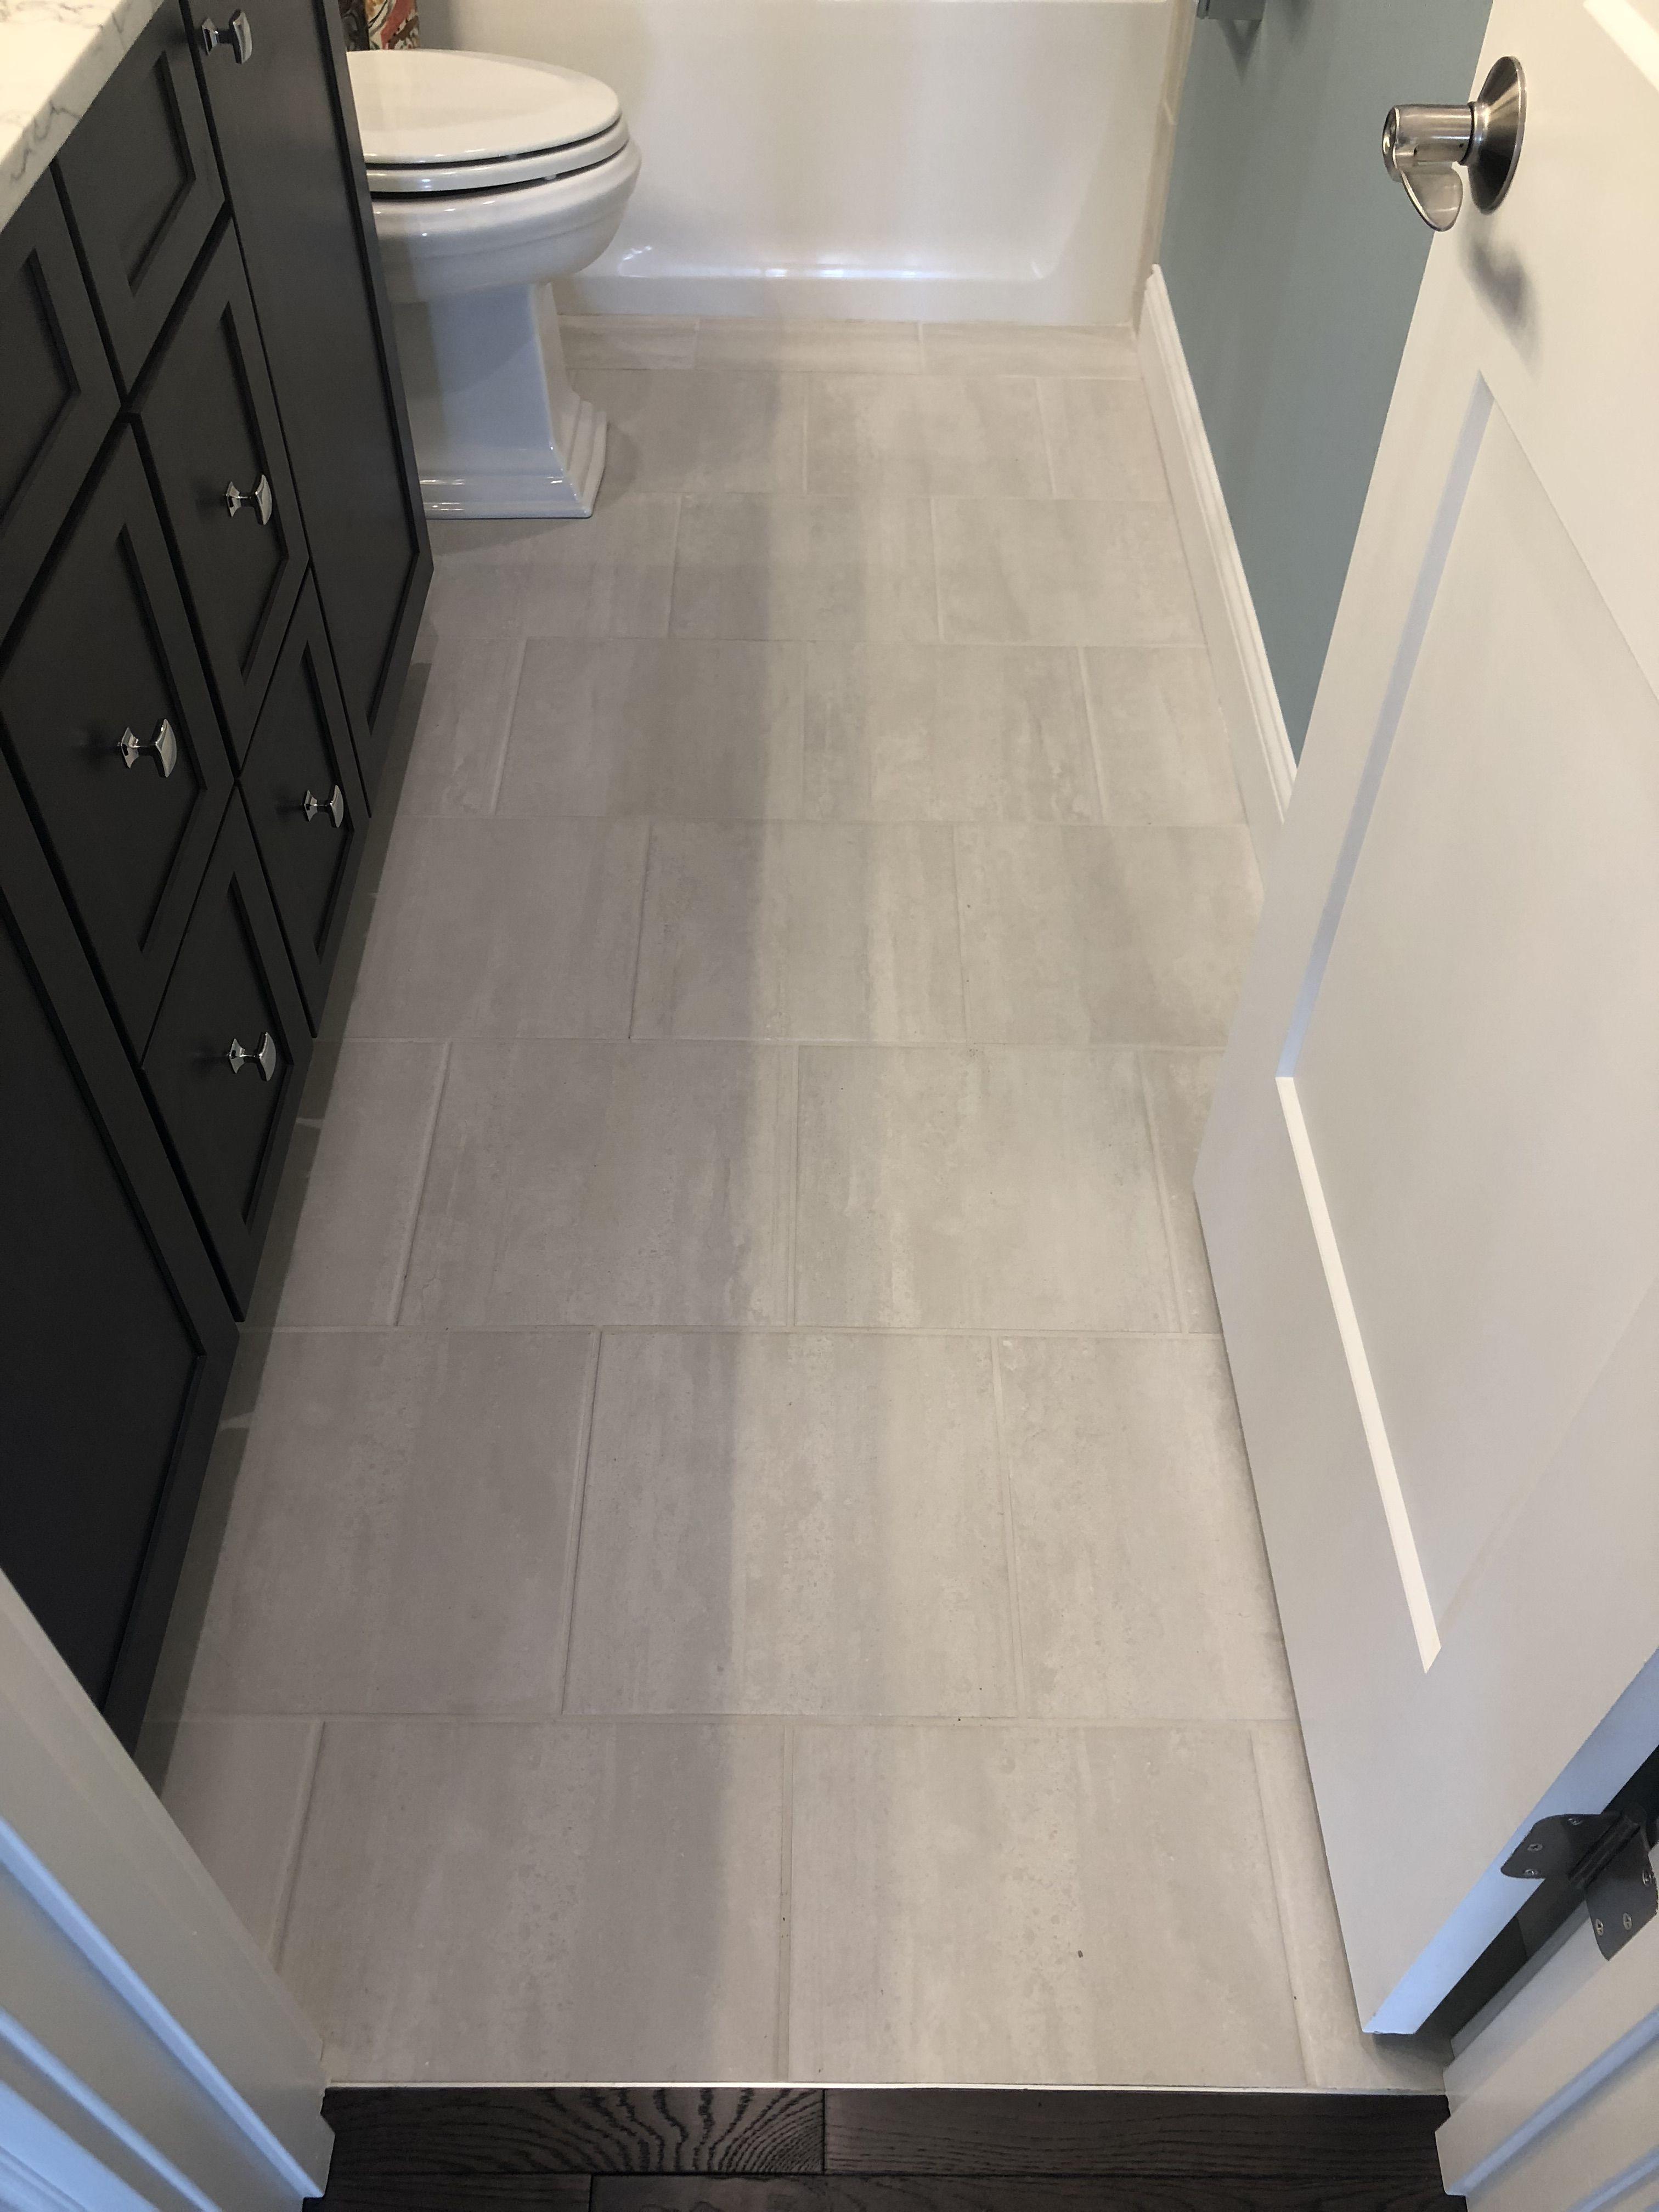 Cove Creek 13x13 Gray Floor Tile Intalled Brick Joint Kitchen Flooring Ideas Inexpensive Textured Tiles Bathroom Inexpensive Flooring 13 x 13 ceramic tile